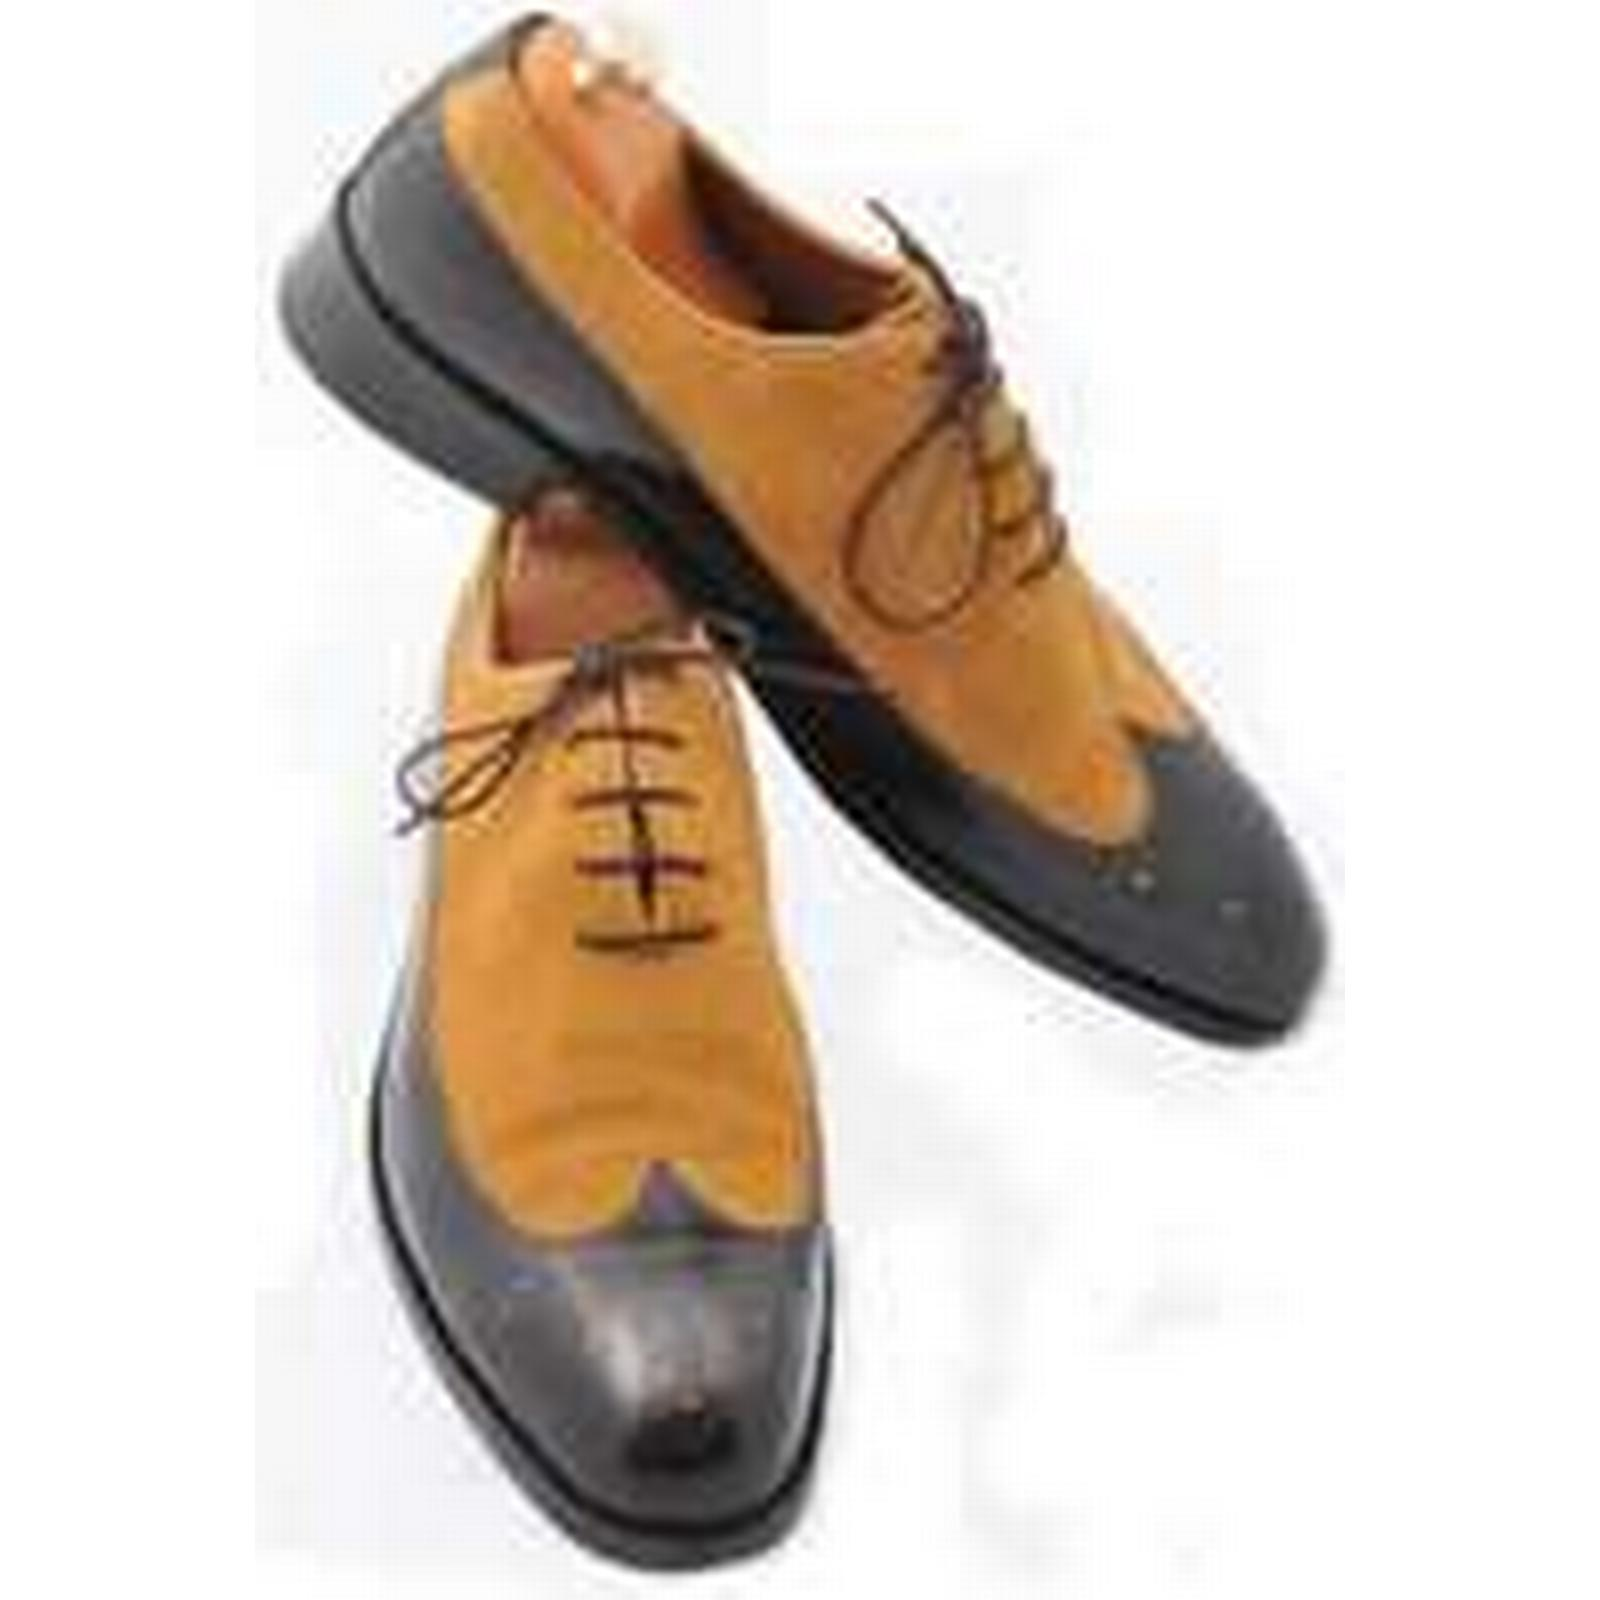 Bonanza (Global) Handmade Men Two Men Tone Wingtip Formal Shoes, Men Two Black And Tan Suede Shoes 3dcb6e